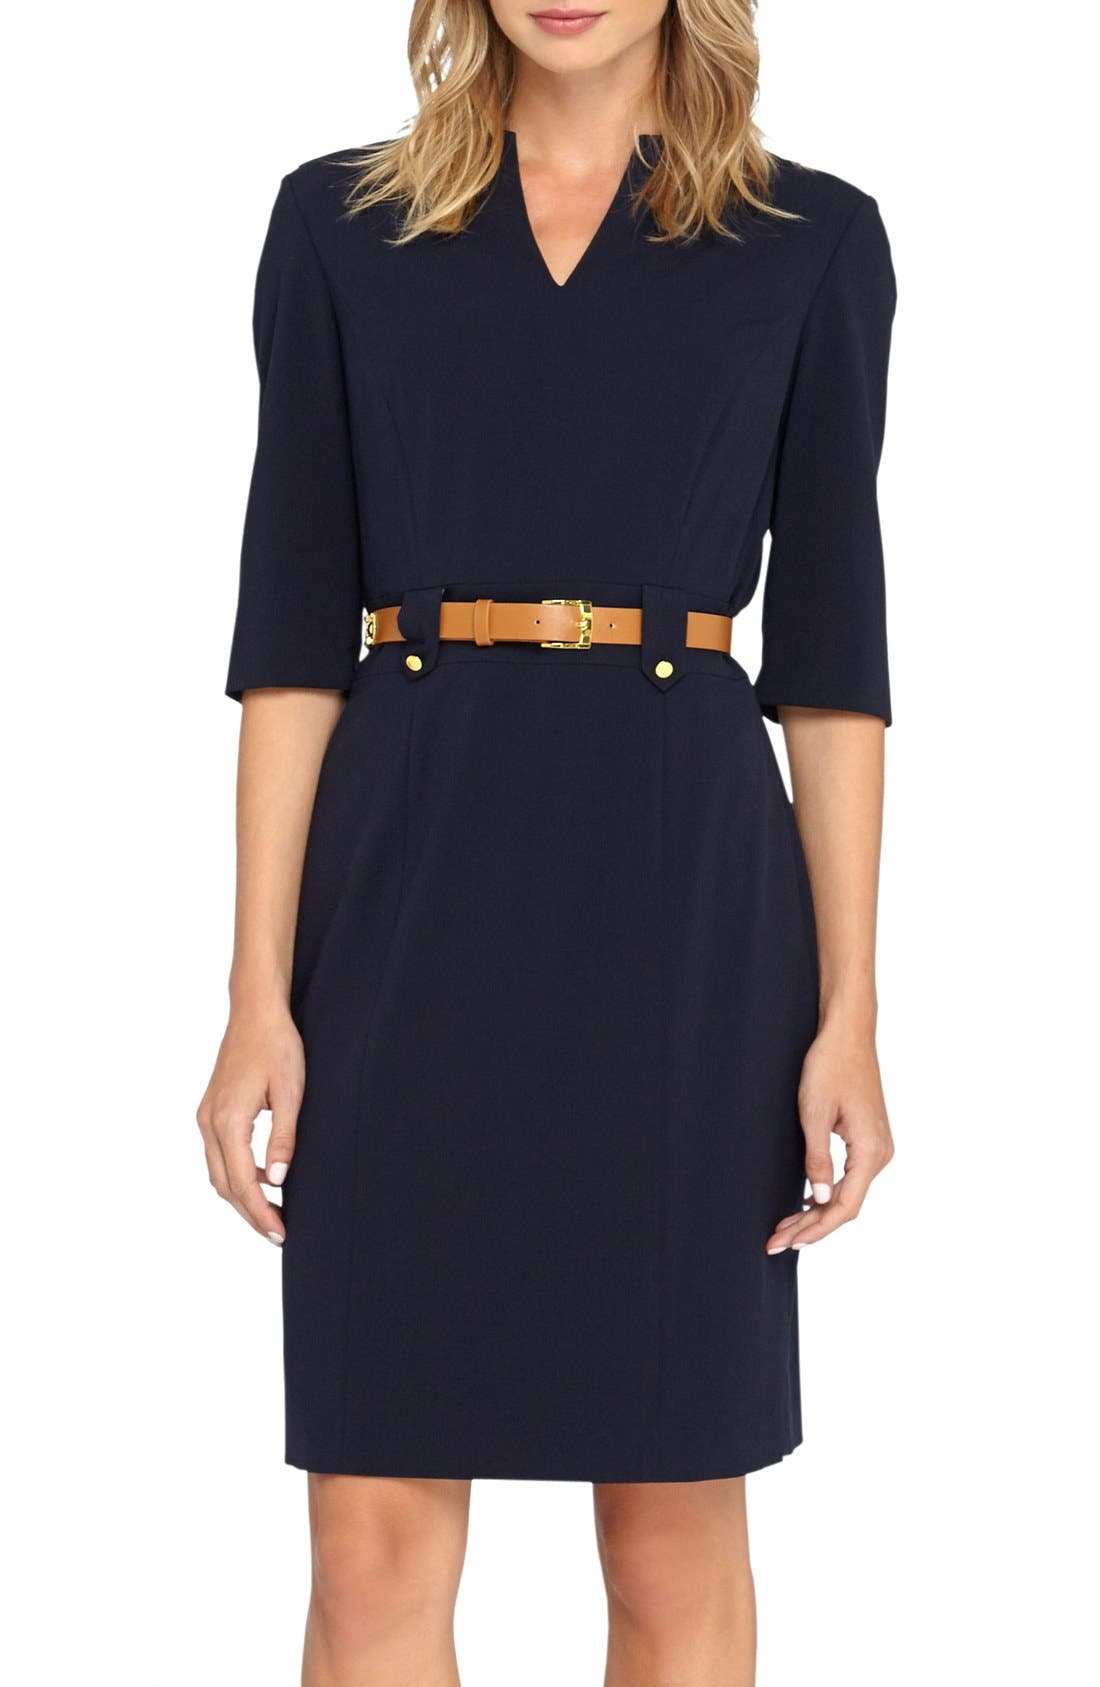 Alternate Image 1 Selected - Tahari Belted Stretch Sheath Dress